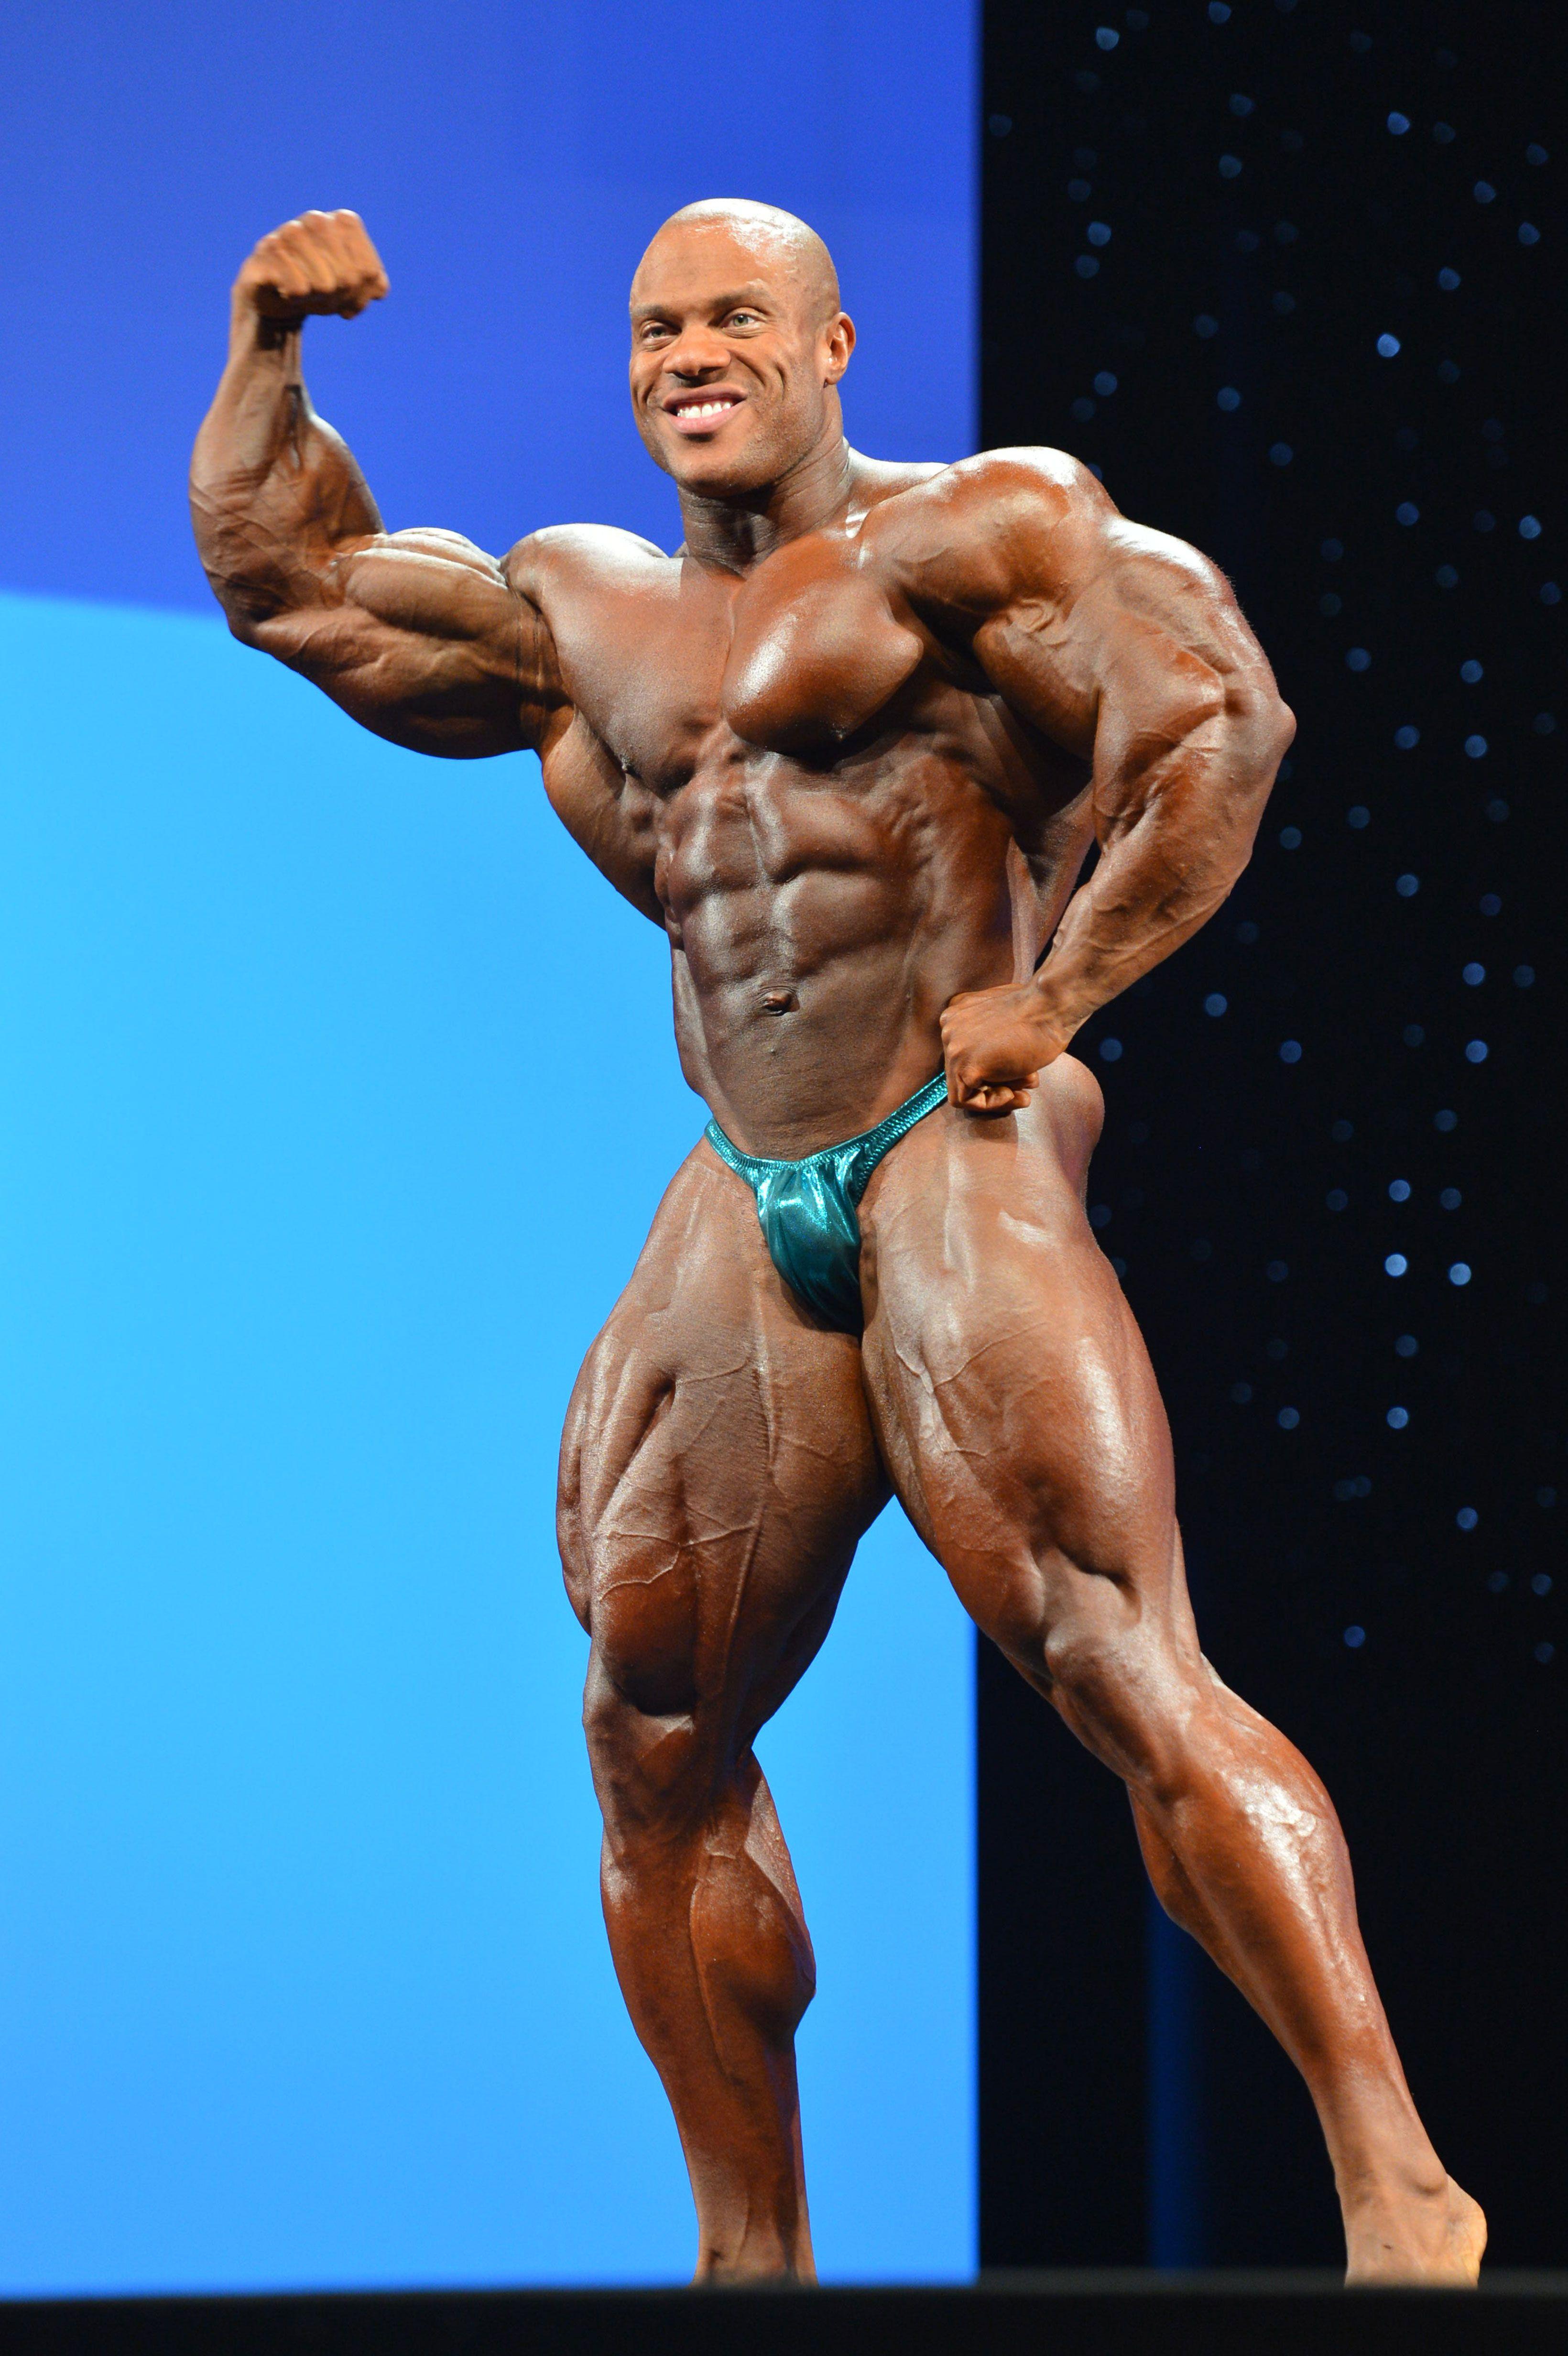 Phil Heath Hi-Res | Phil Health - Bodybuilder | Pinterest ...